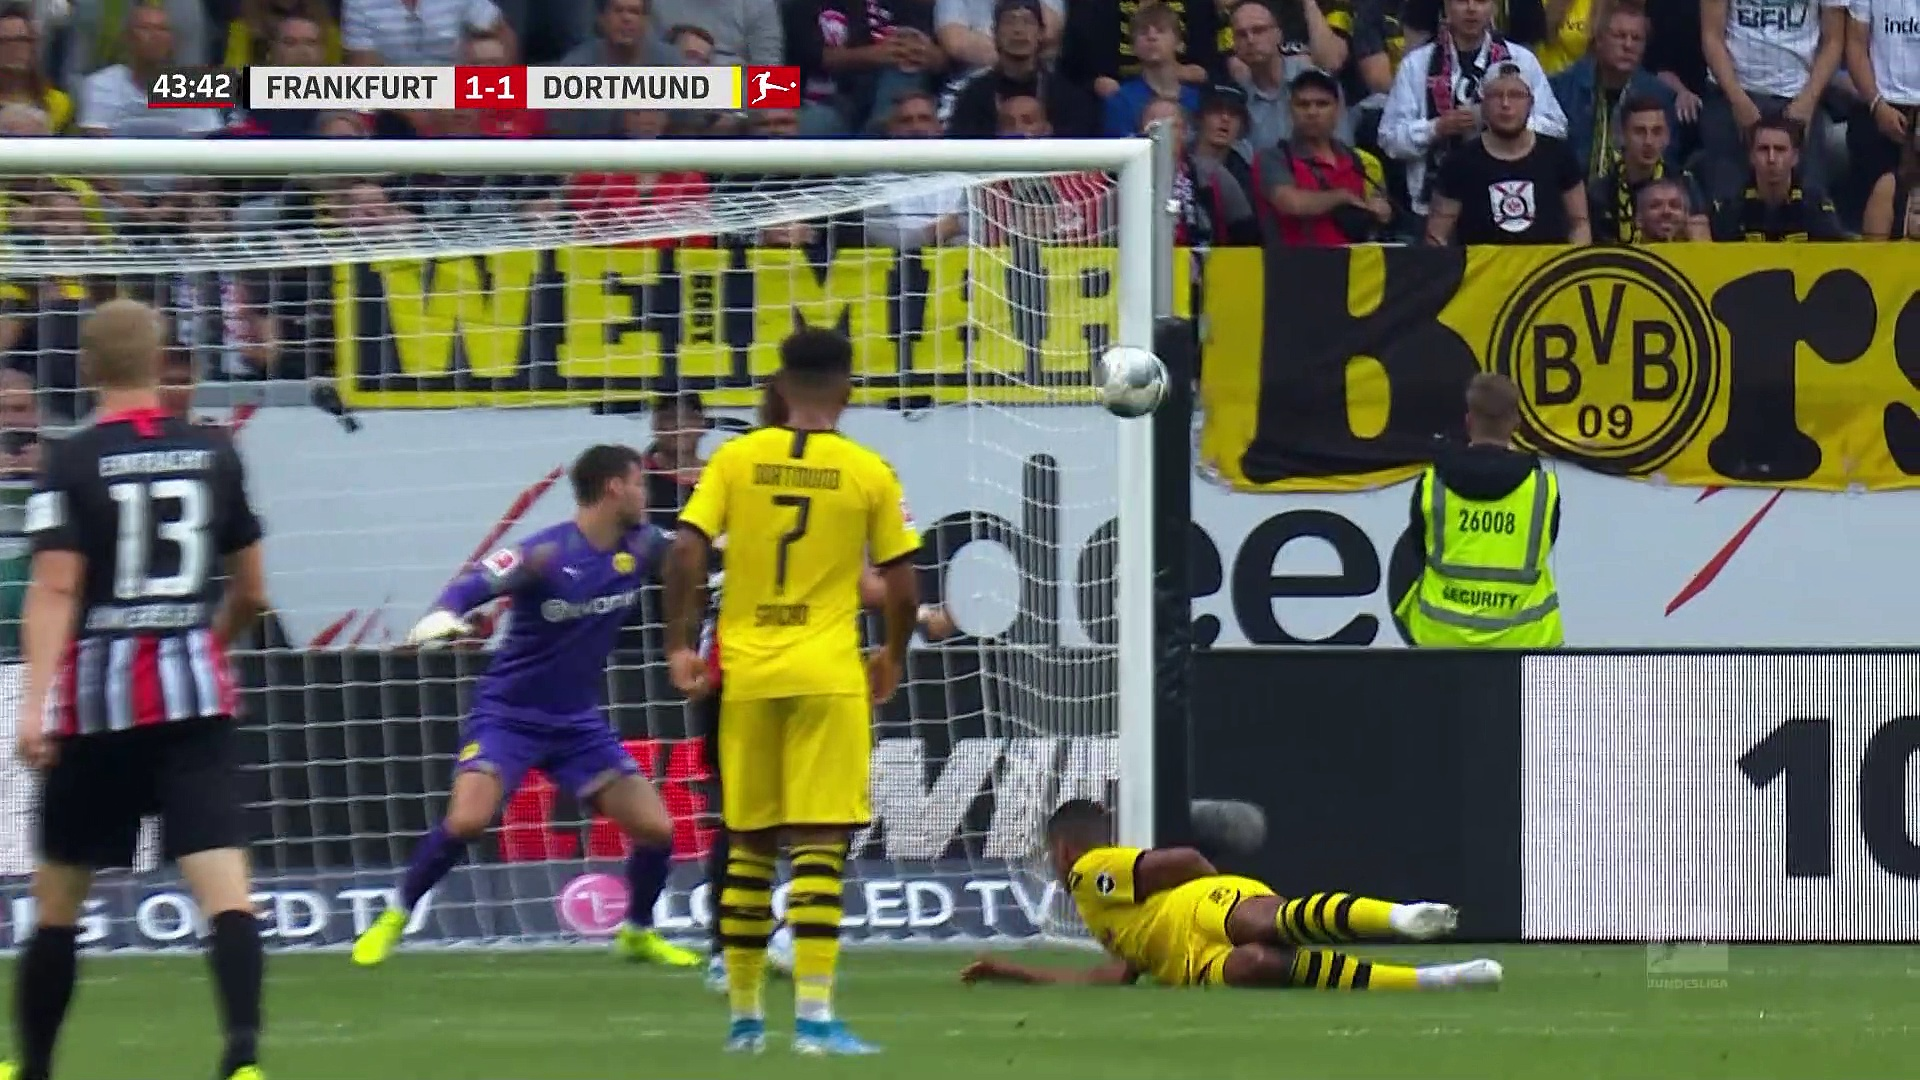 5. Hafta / Eintracht Frankfurt - Borussia Dortmund: 2-2 (Özet)